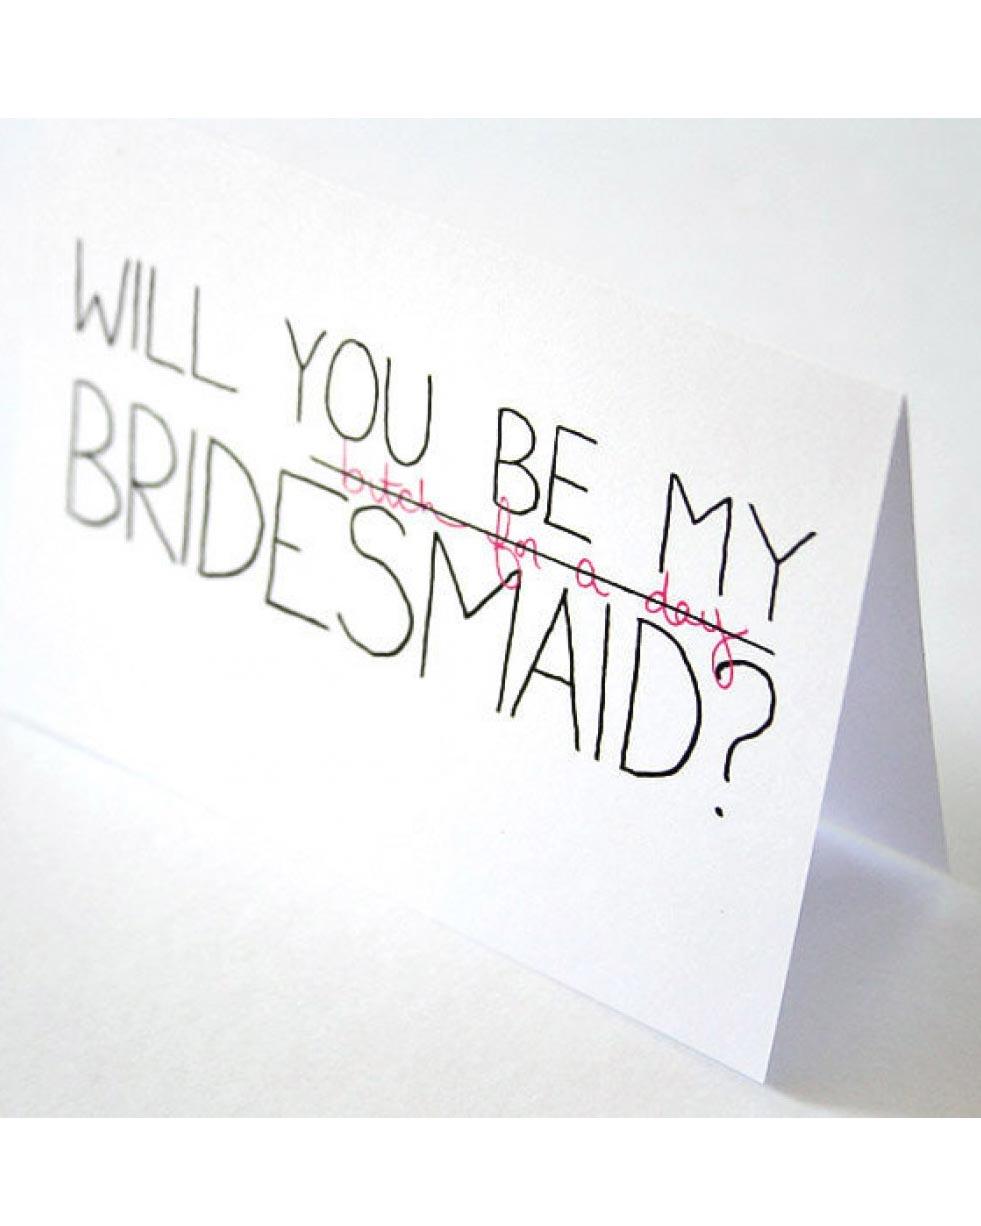 cloud-parade-will-you-be-my-bridesmaid-card-0216.jpg